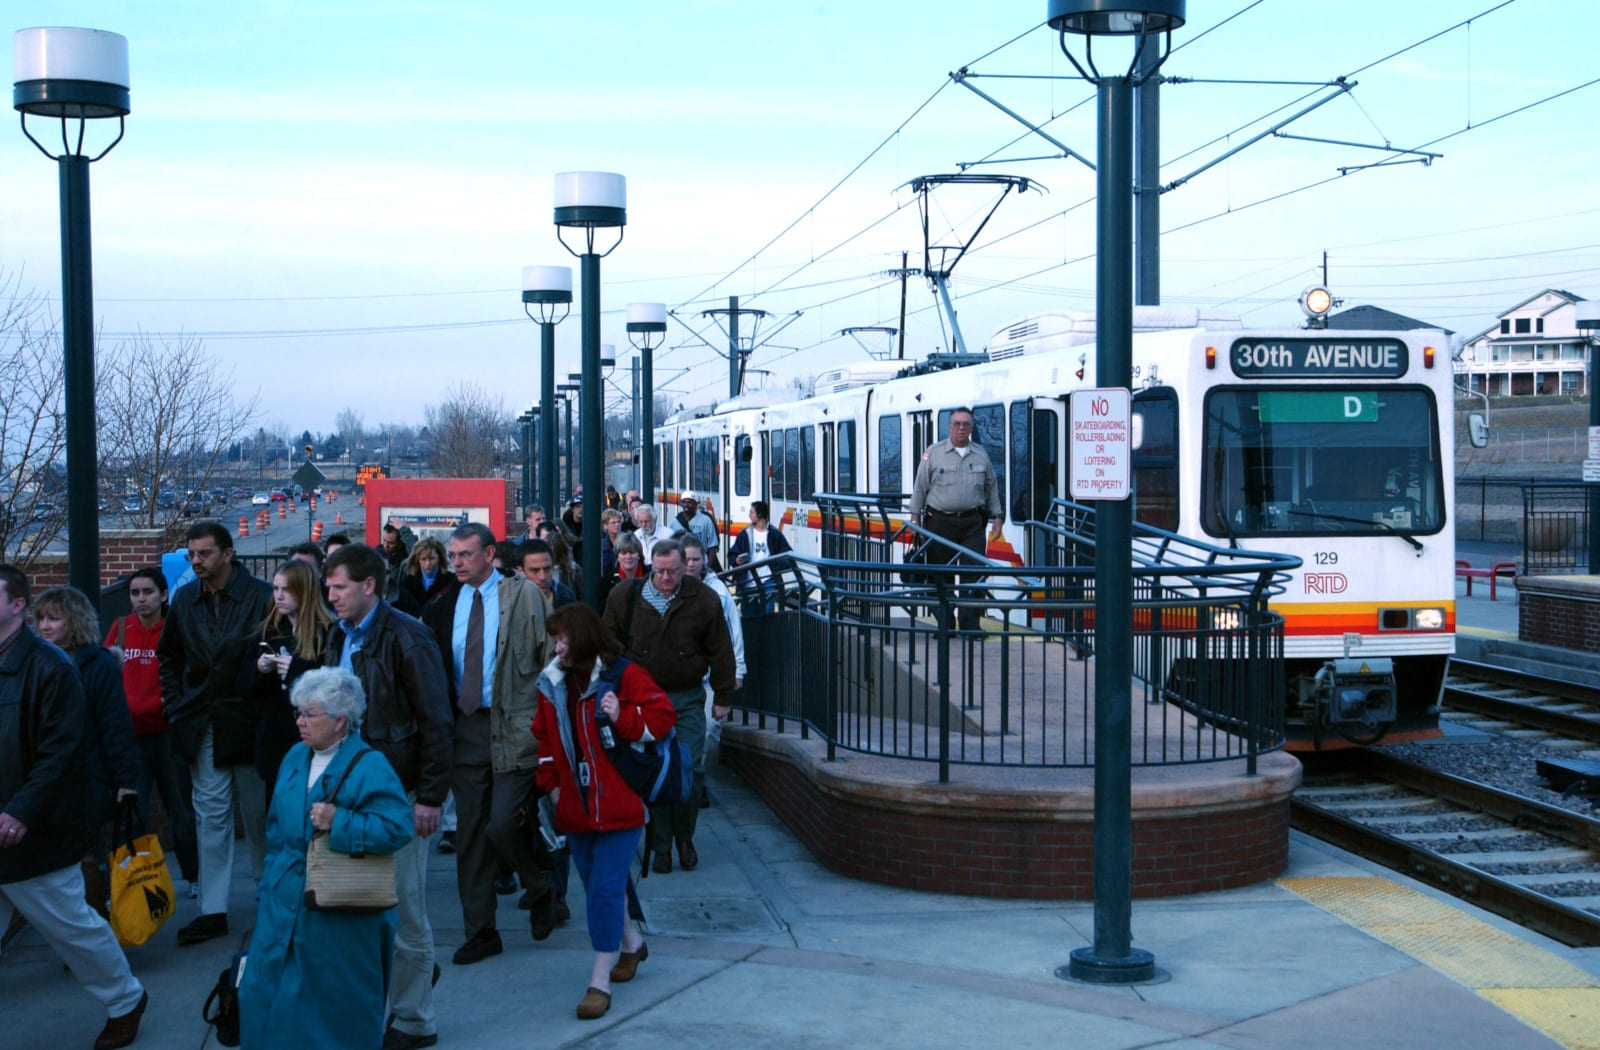 RTD Train Mineral Station Crowd Littleton CO